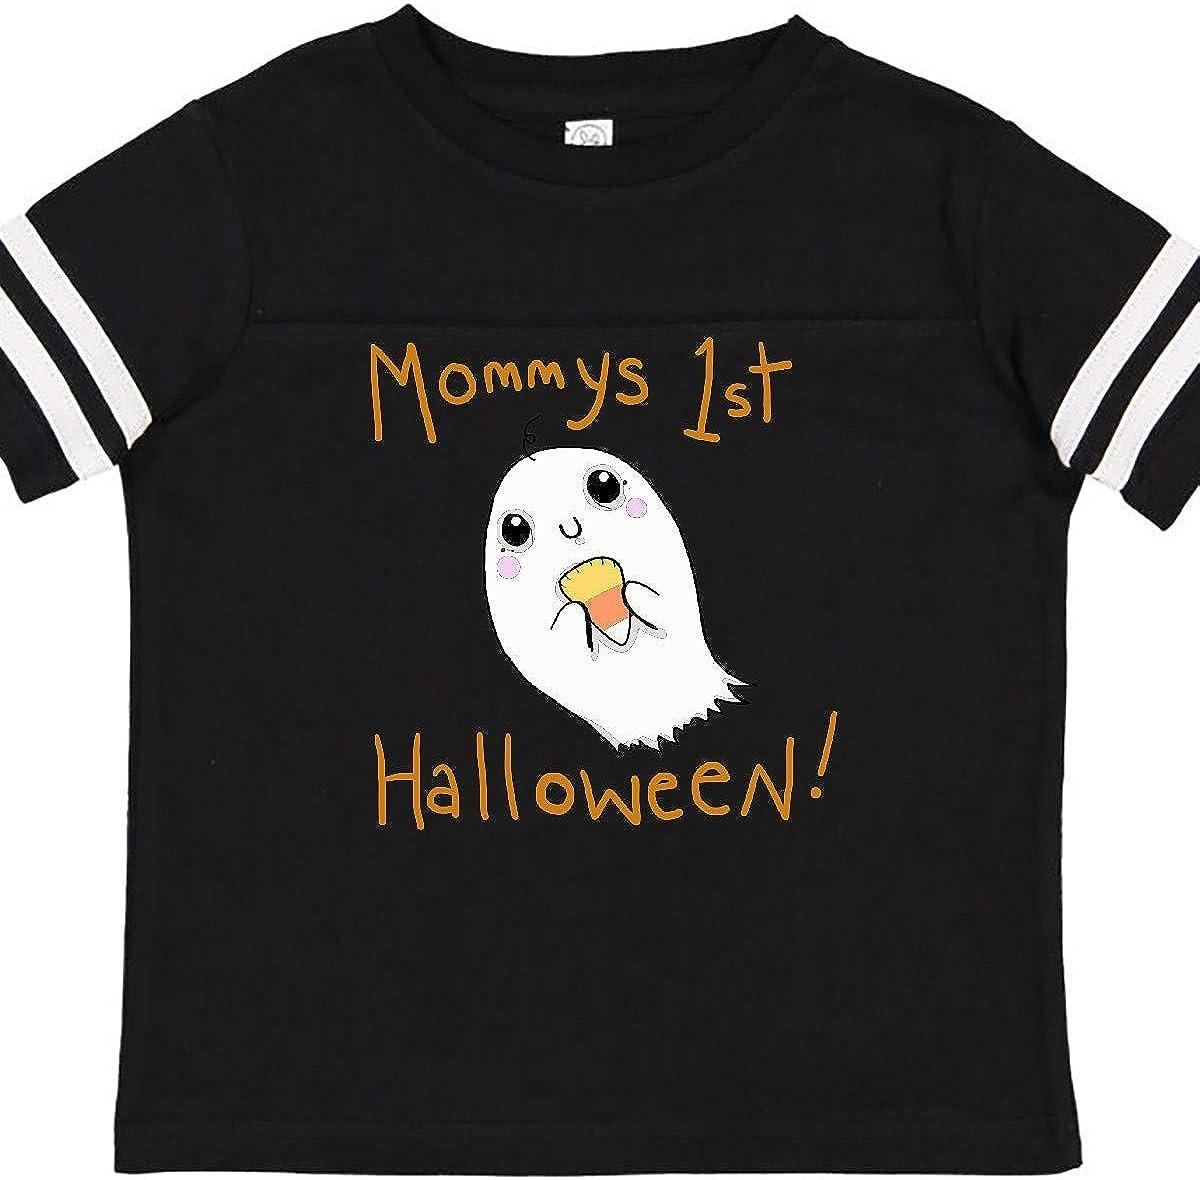 inktastic Mommy 1st Halloween Toddler T-Shirt Gus Fink Studios